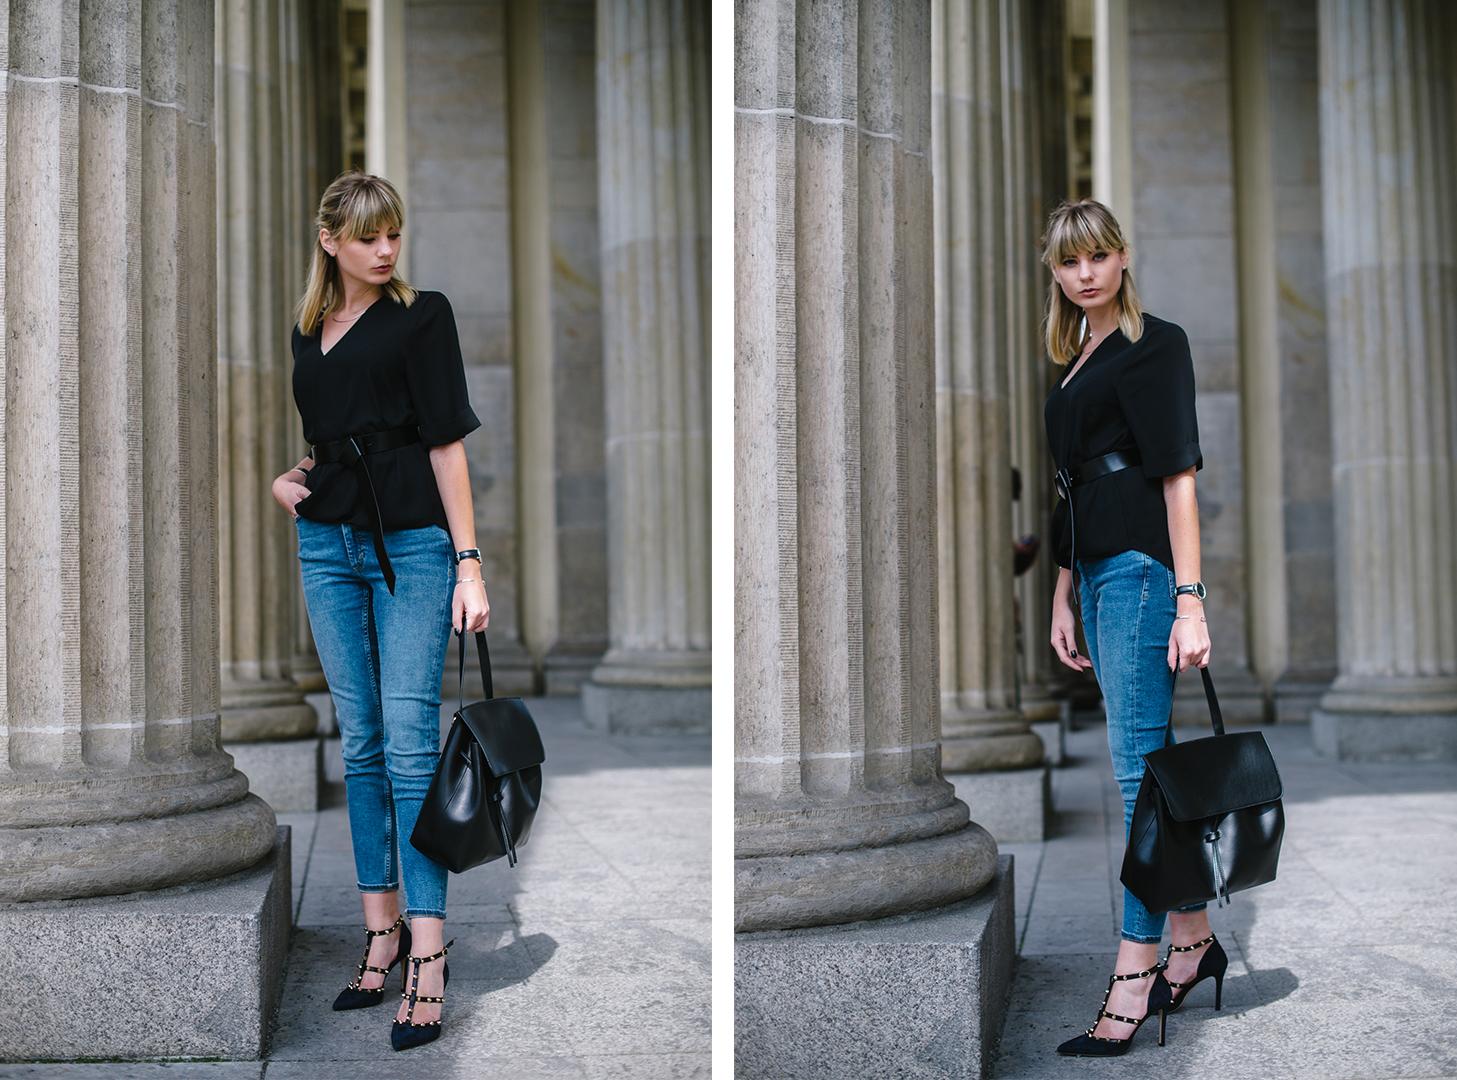 Andrea Puccini Pumps_Frühsommeroutfit_Brandenburgertor_Berlin_Kiamisu_Modeblog_Fashionblog-final3